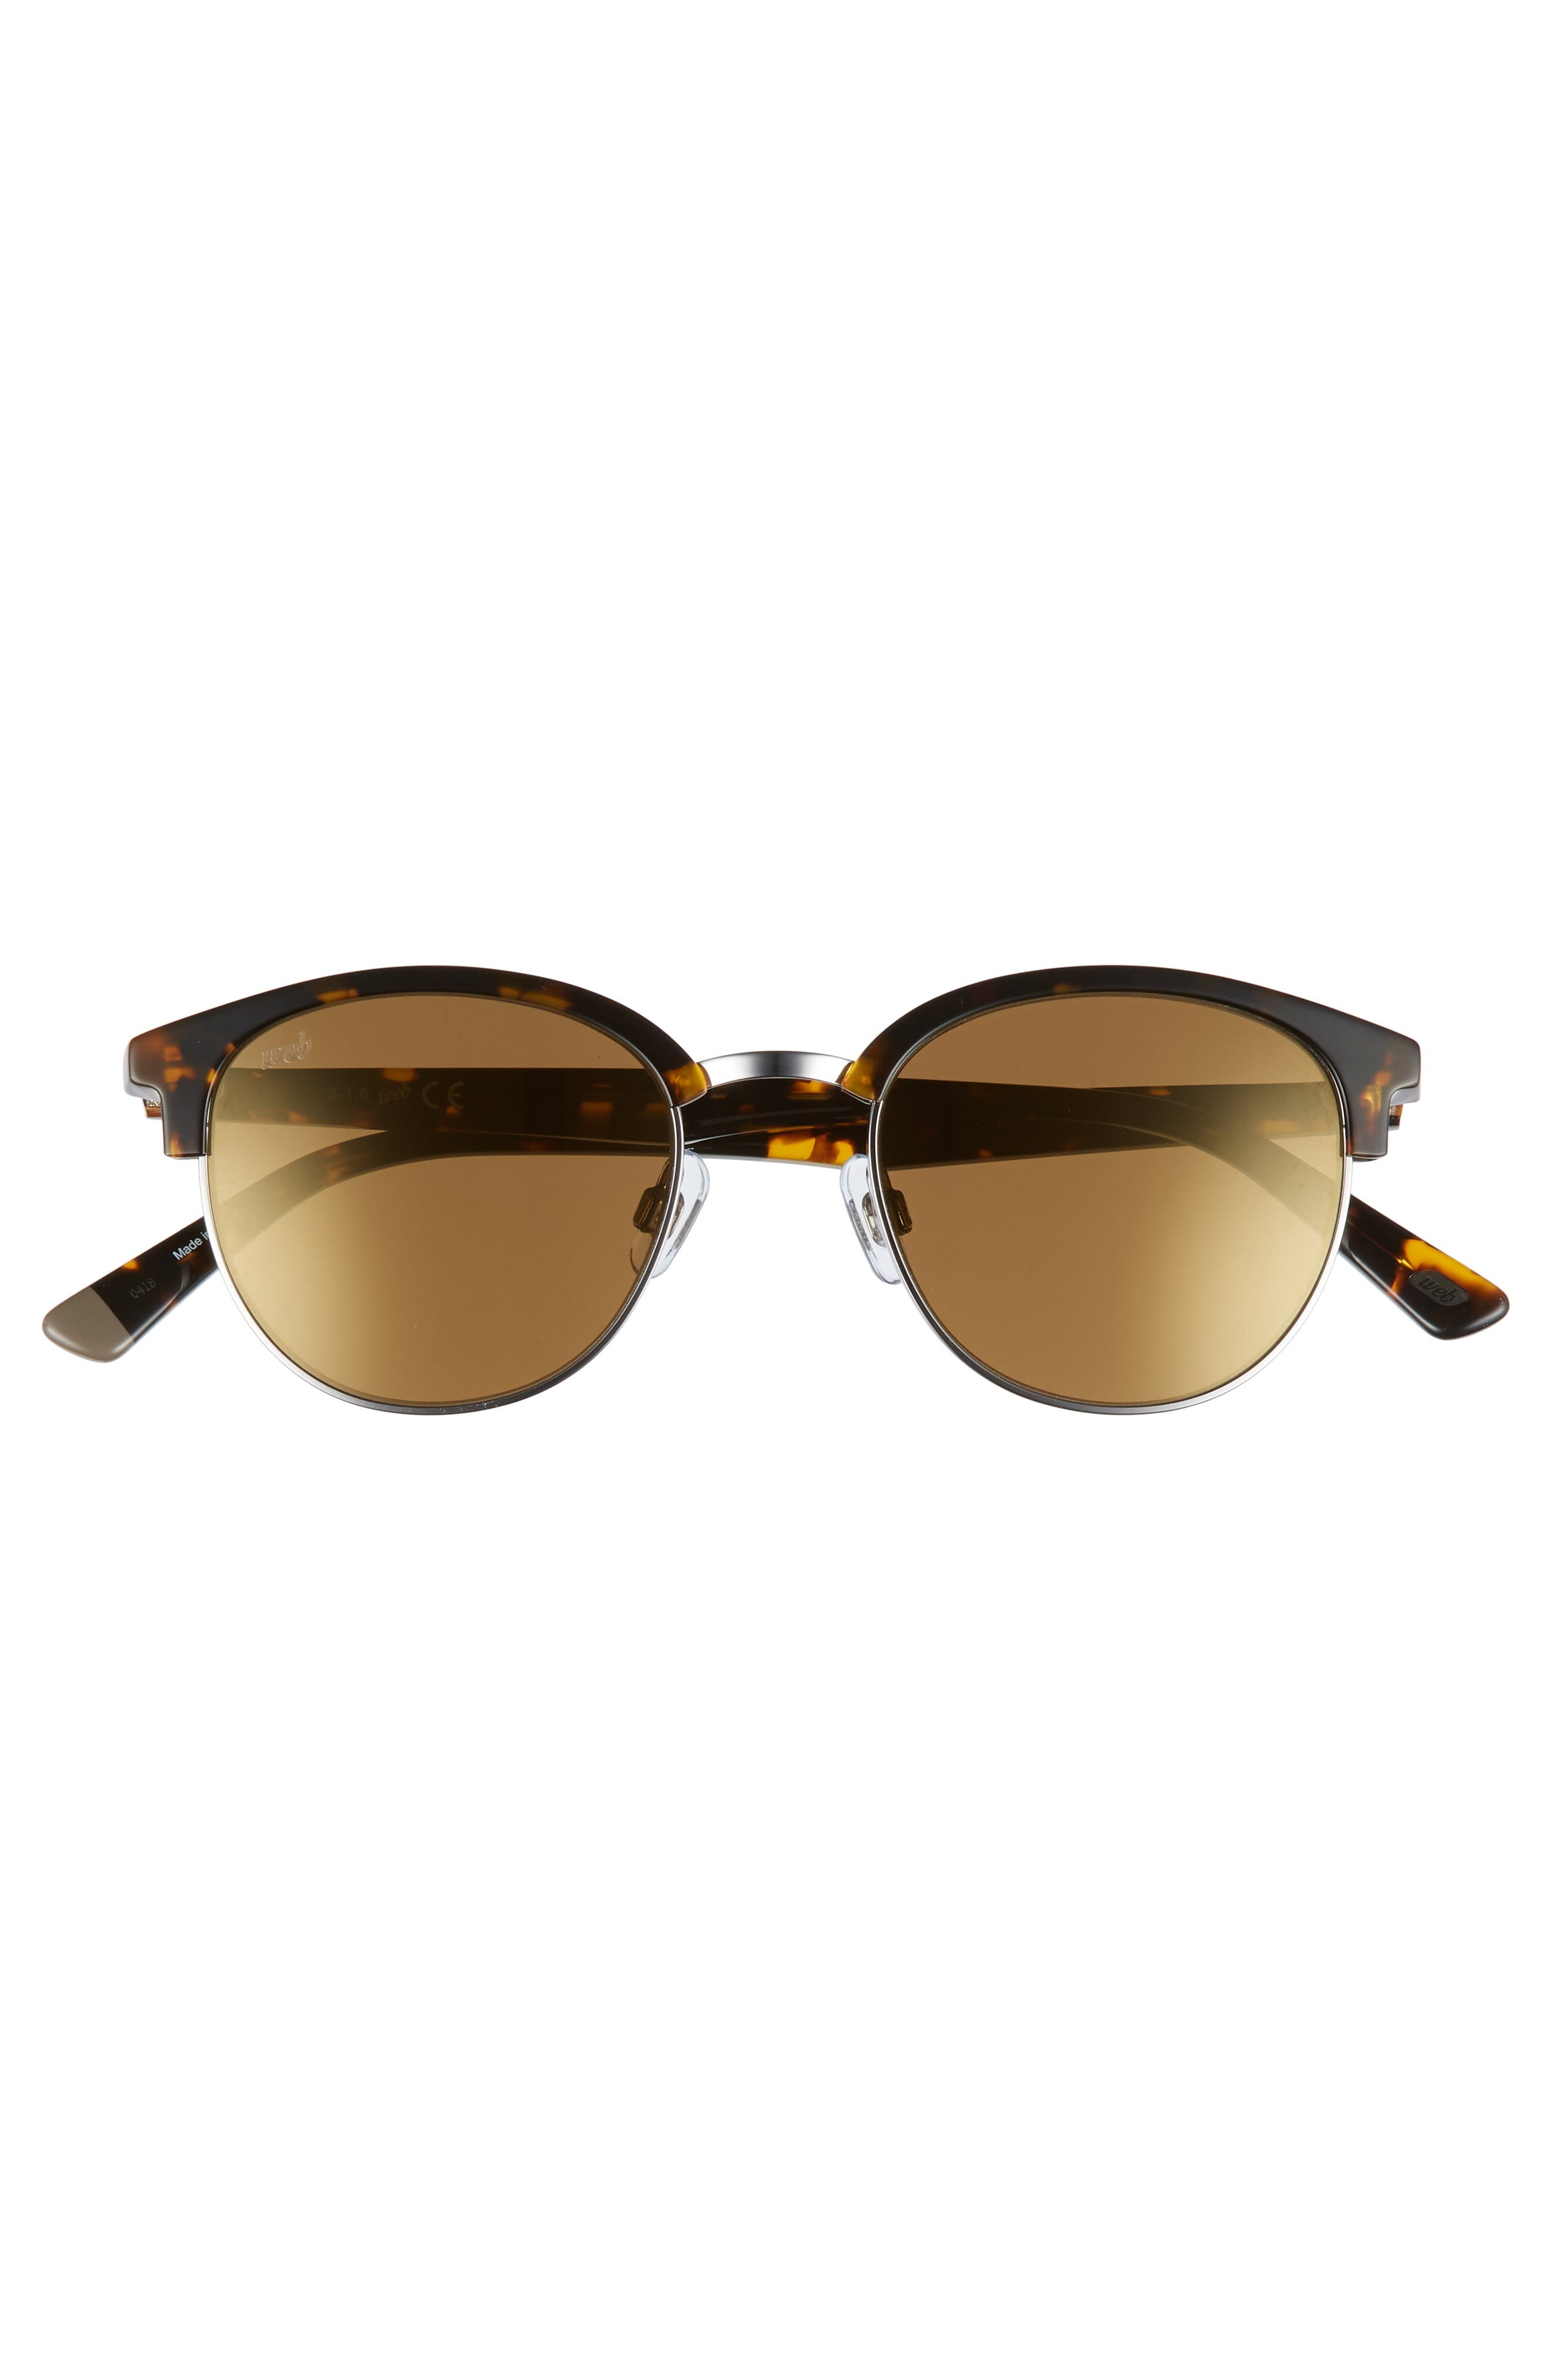 49mm Half Rim Sunglasses,                             Alternate thumbnail 3, color,                             Shiny Gunmetal/ Brown Mirror